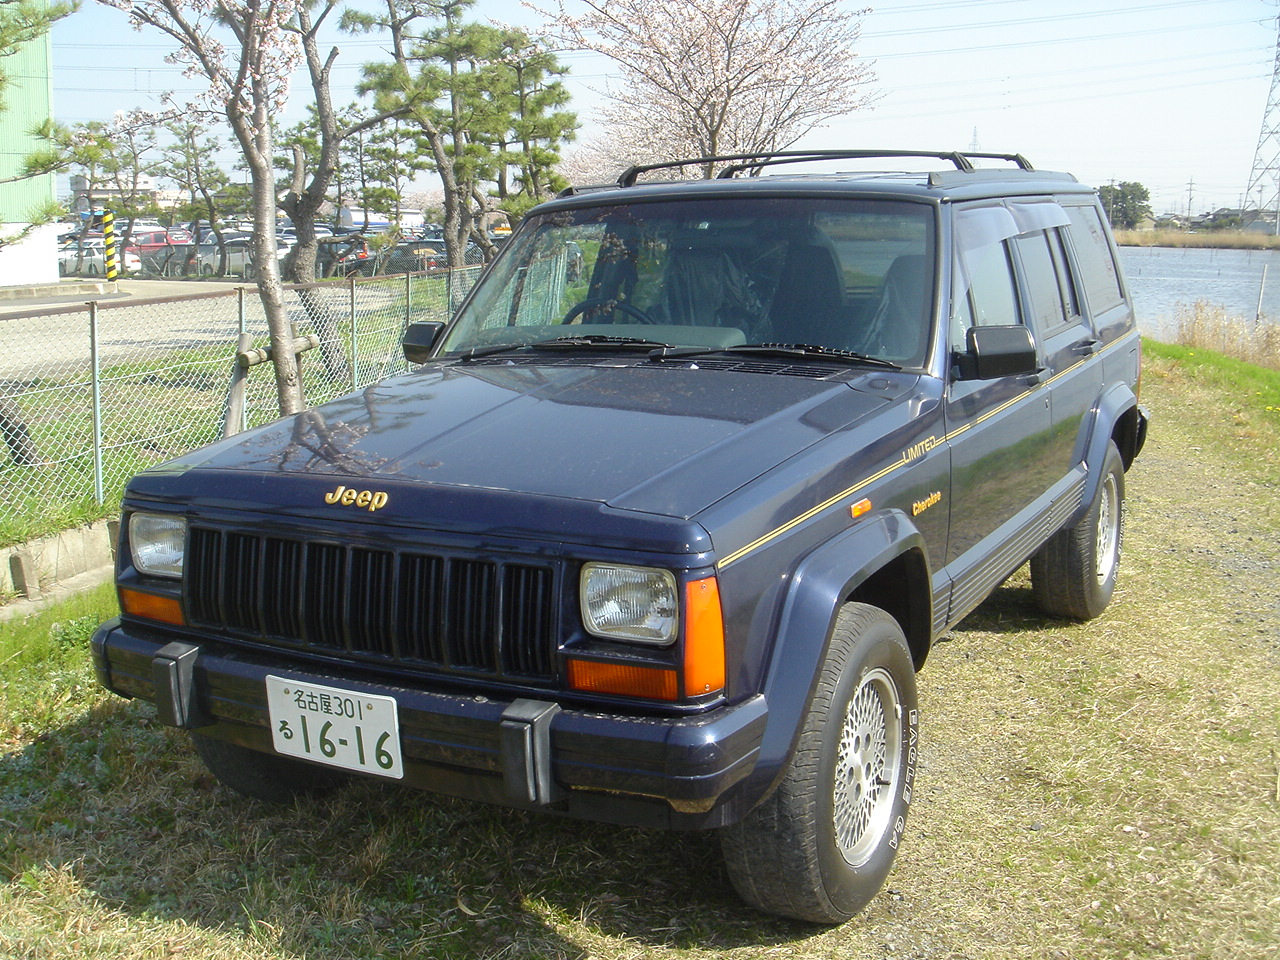 jeep cherokee ltd 1995 used for sale. Black Bedroom Furniture Sets. Home Design Ideas